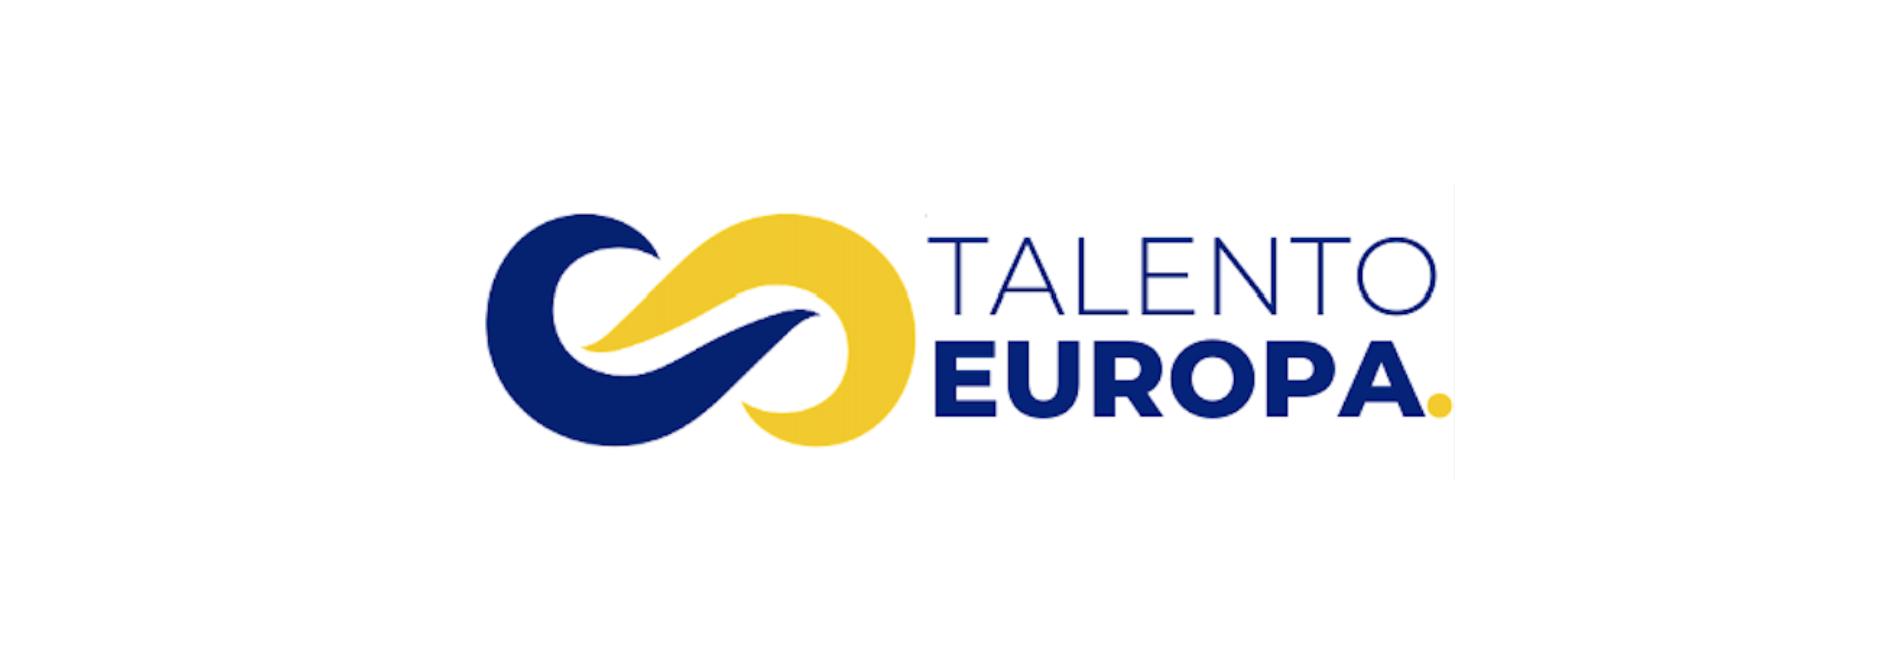 Talento Europa Logo